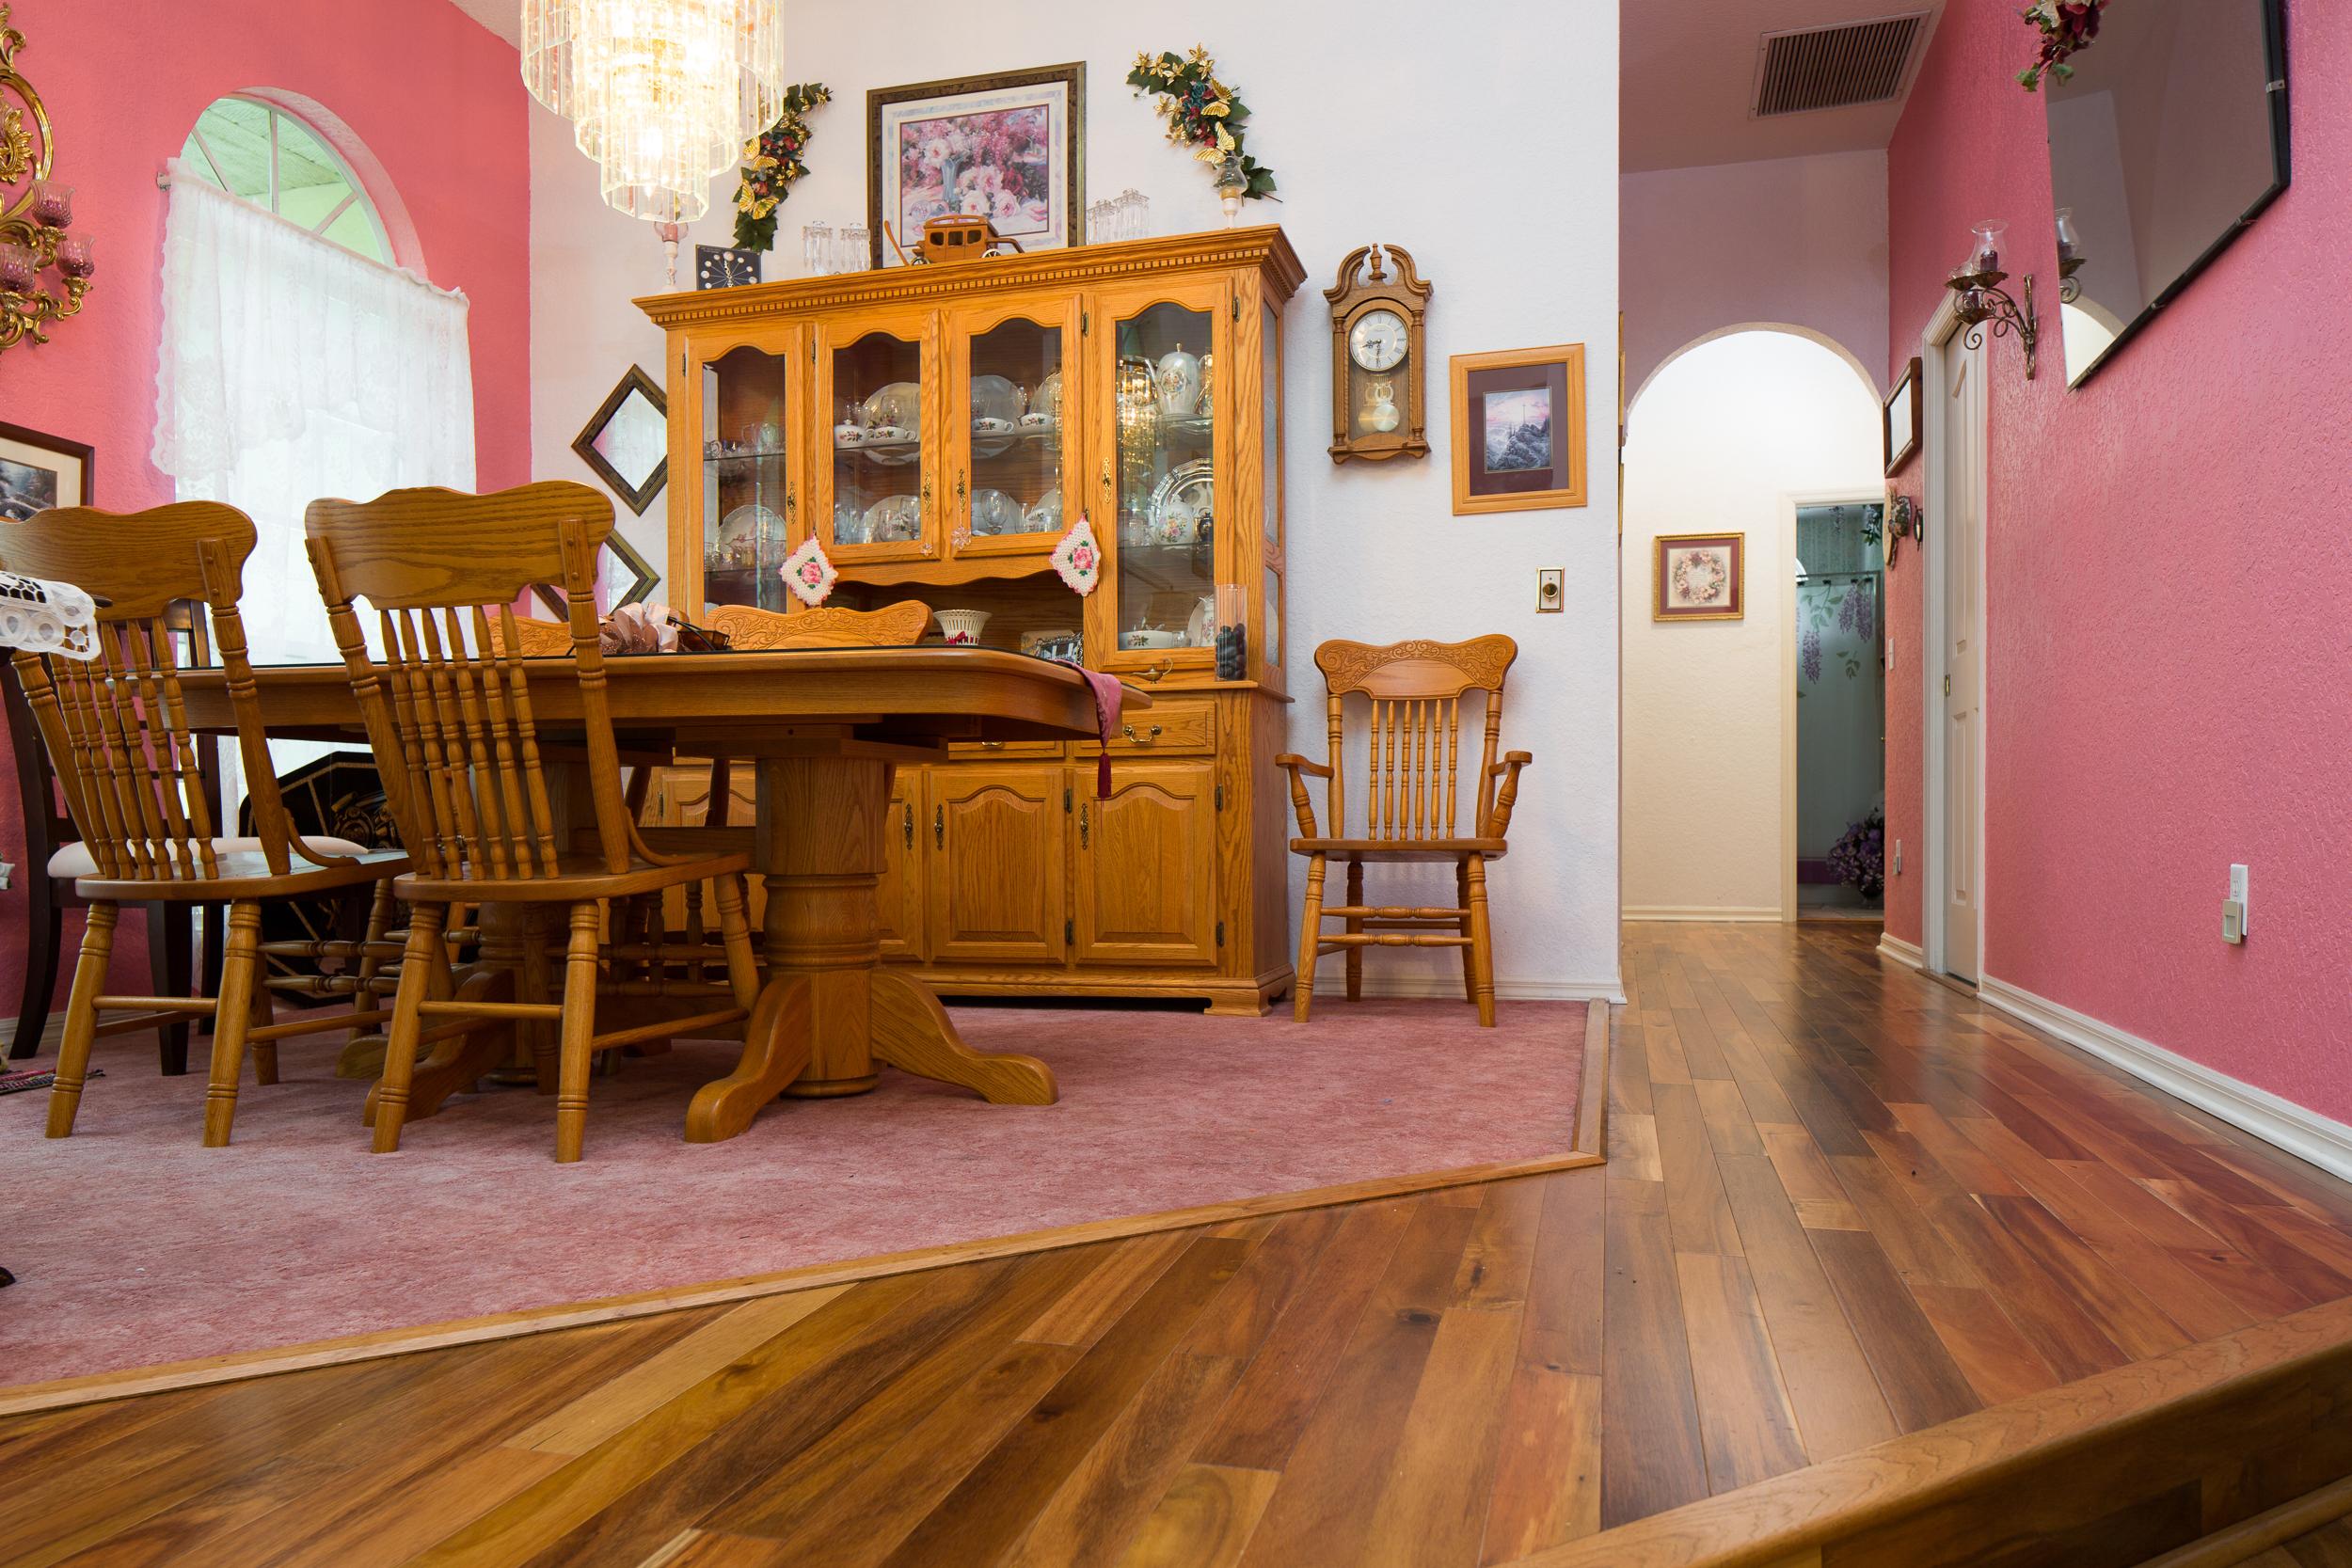 hardwood floors in dining